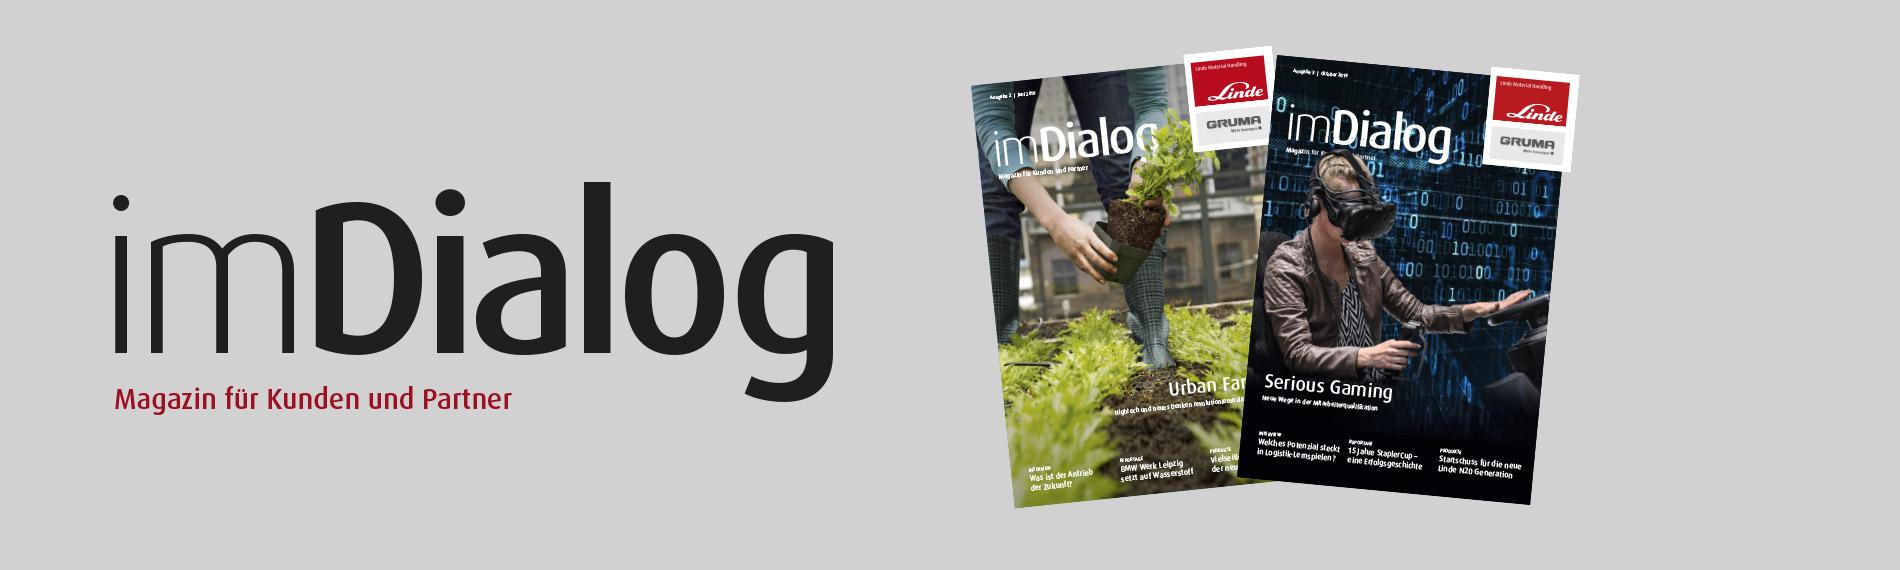 imdialog cover zeitschrift kunden partner